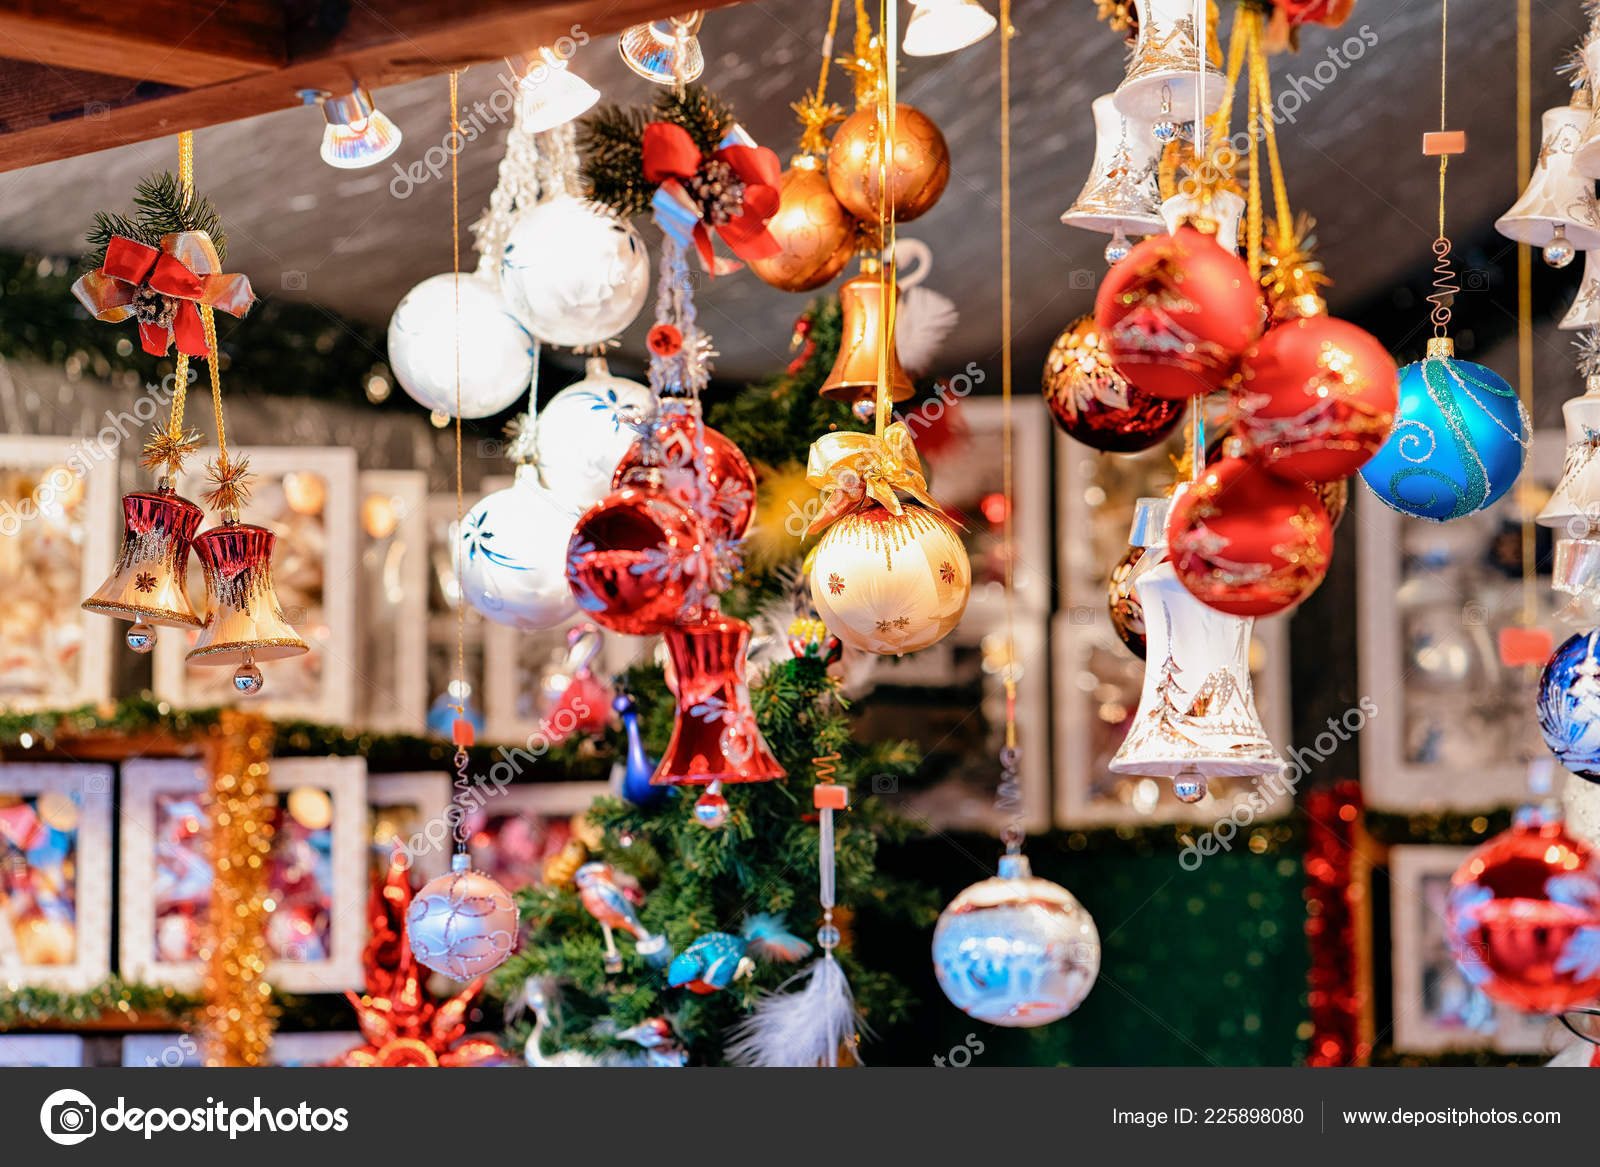 Christmas Tree Decorations Christmas Market Town Hall Winter Berlin Germany– stock image